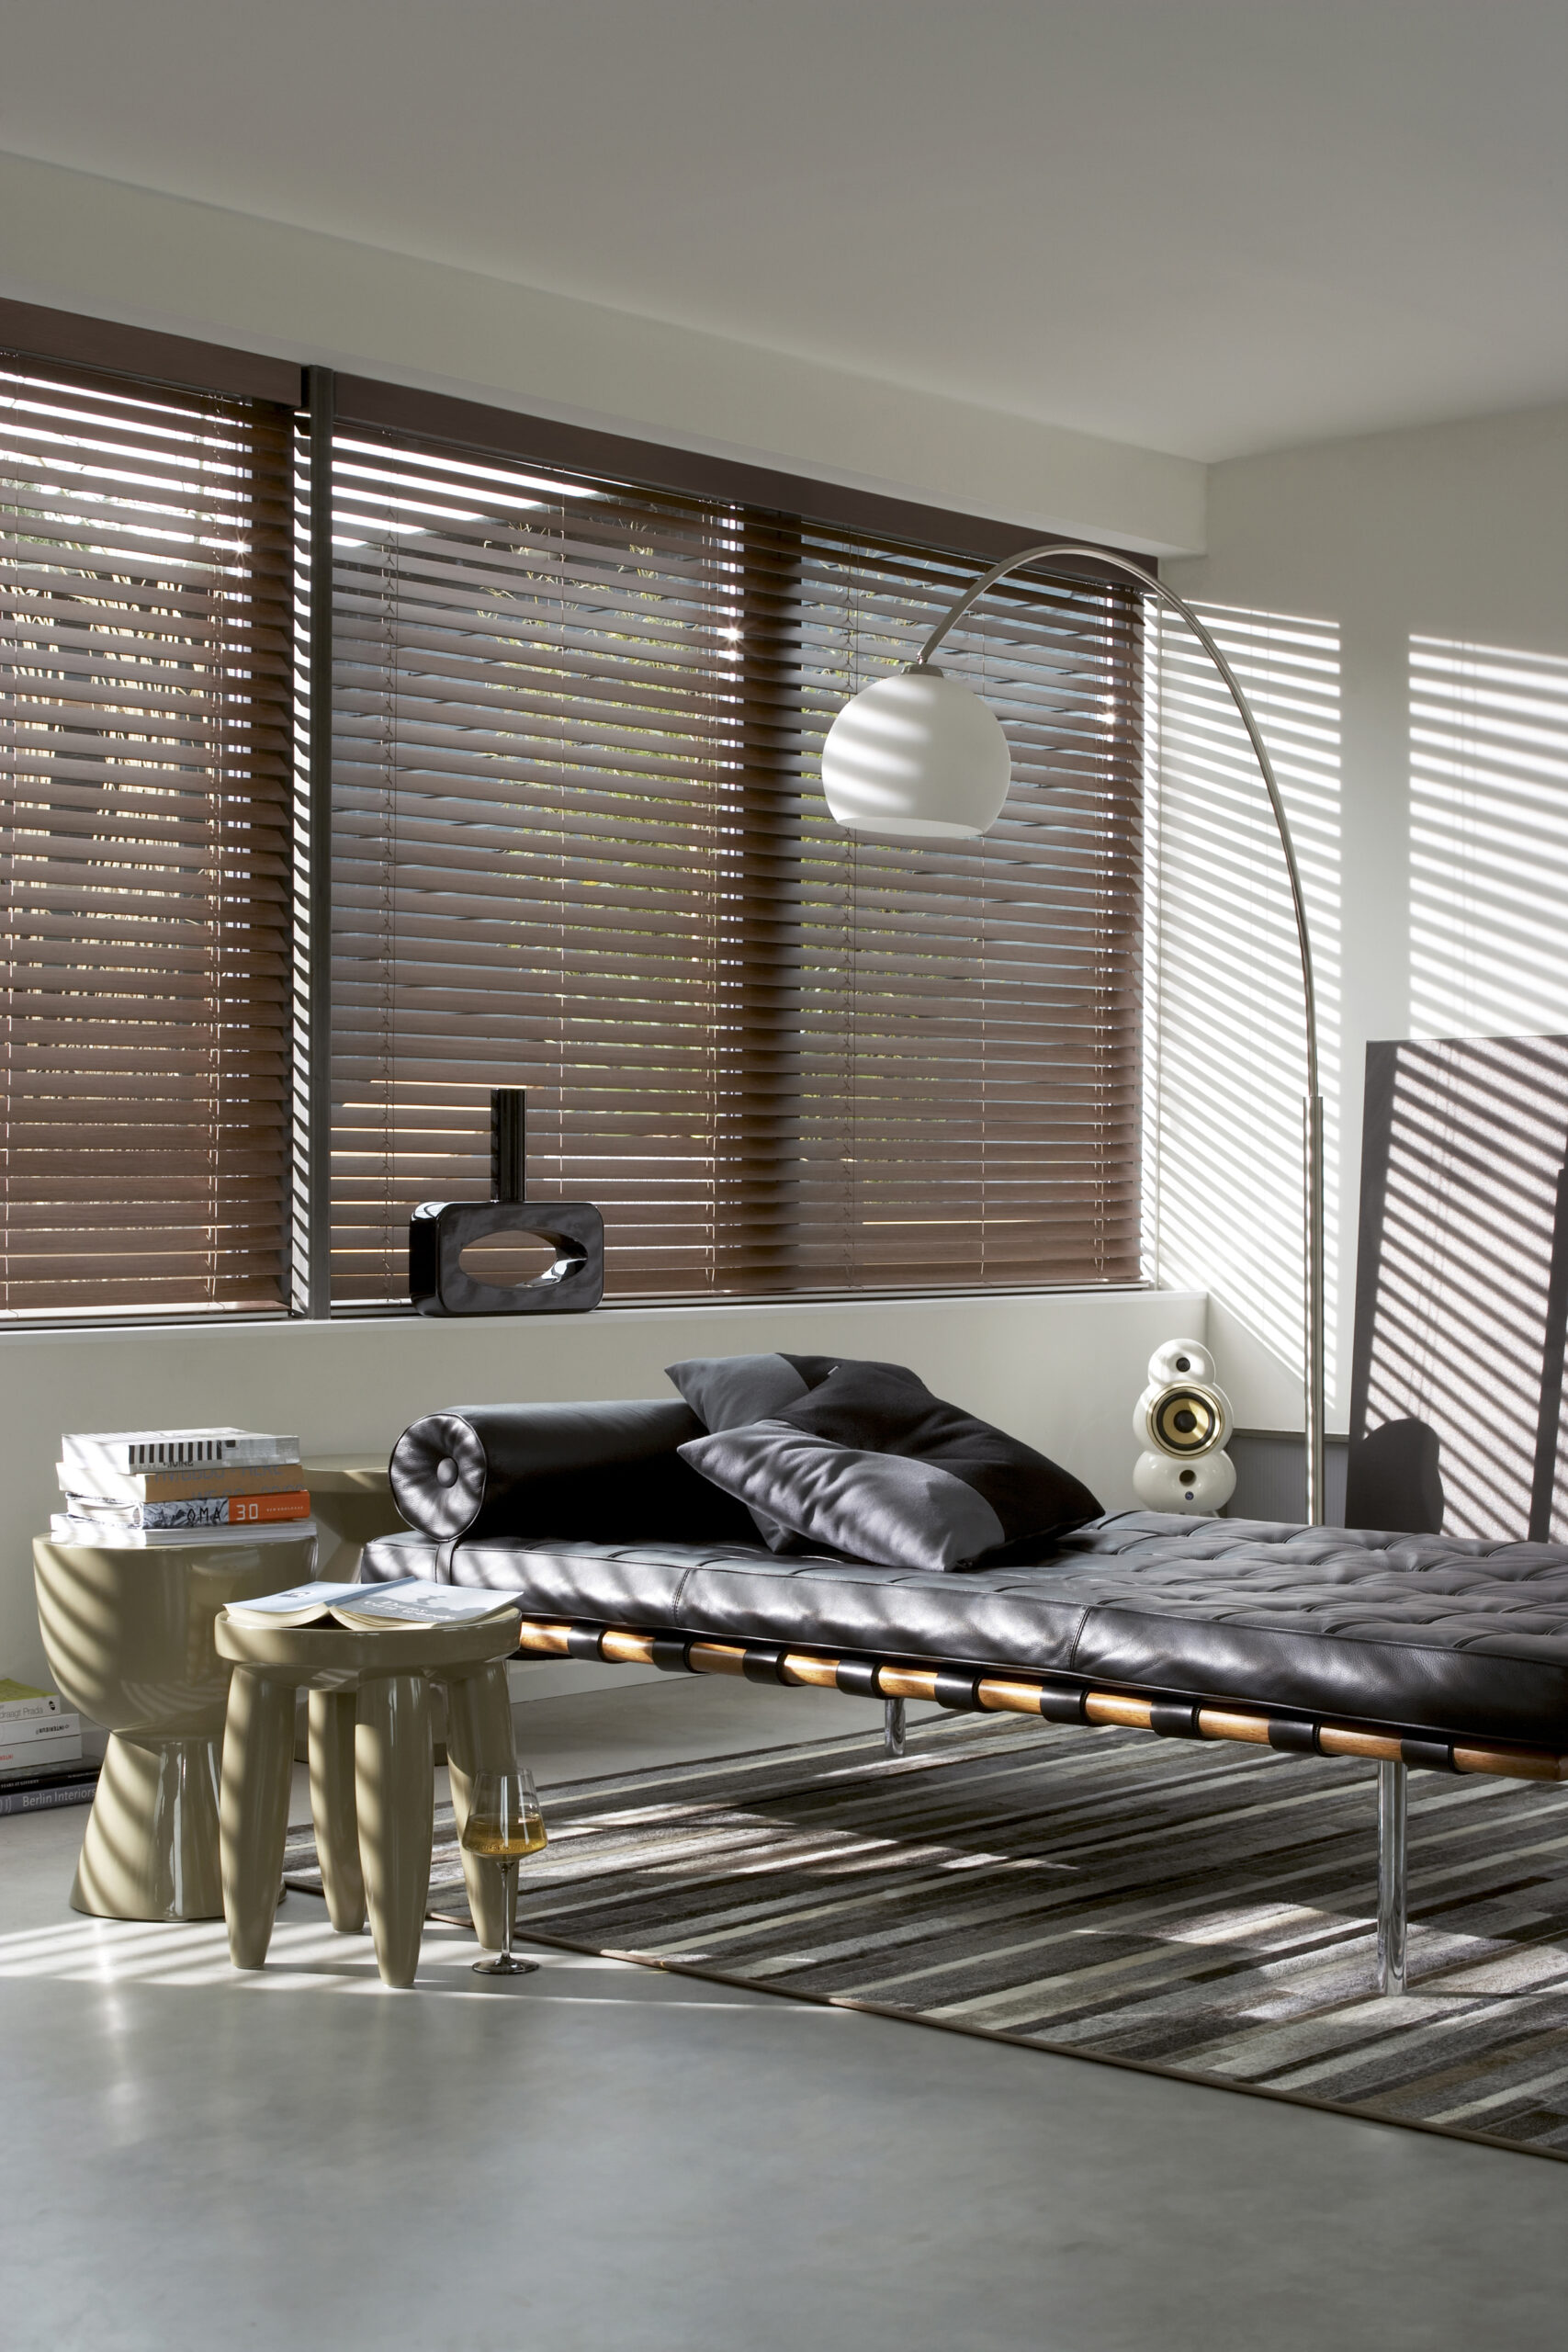 JOOZ-interieur-Raamdecoratie-Jaloezie-hout